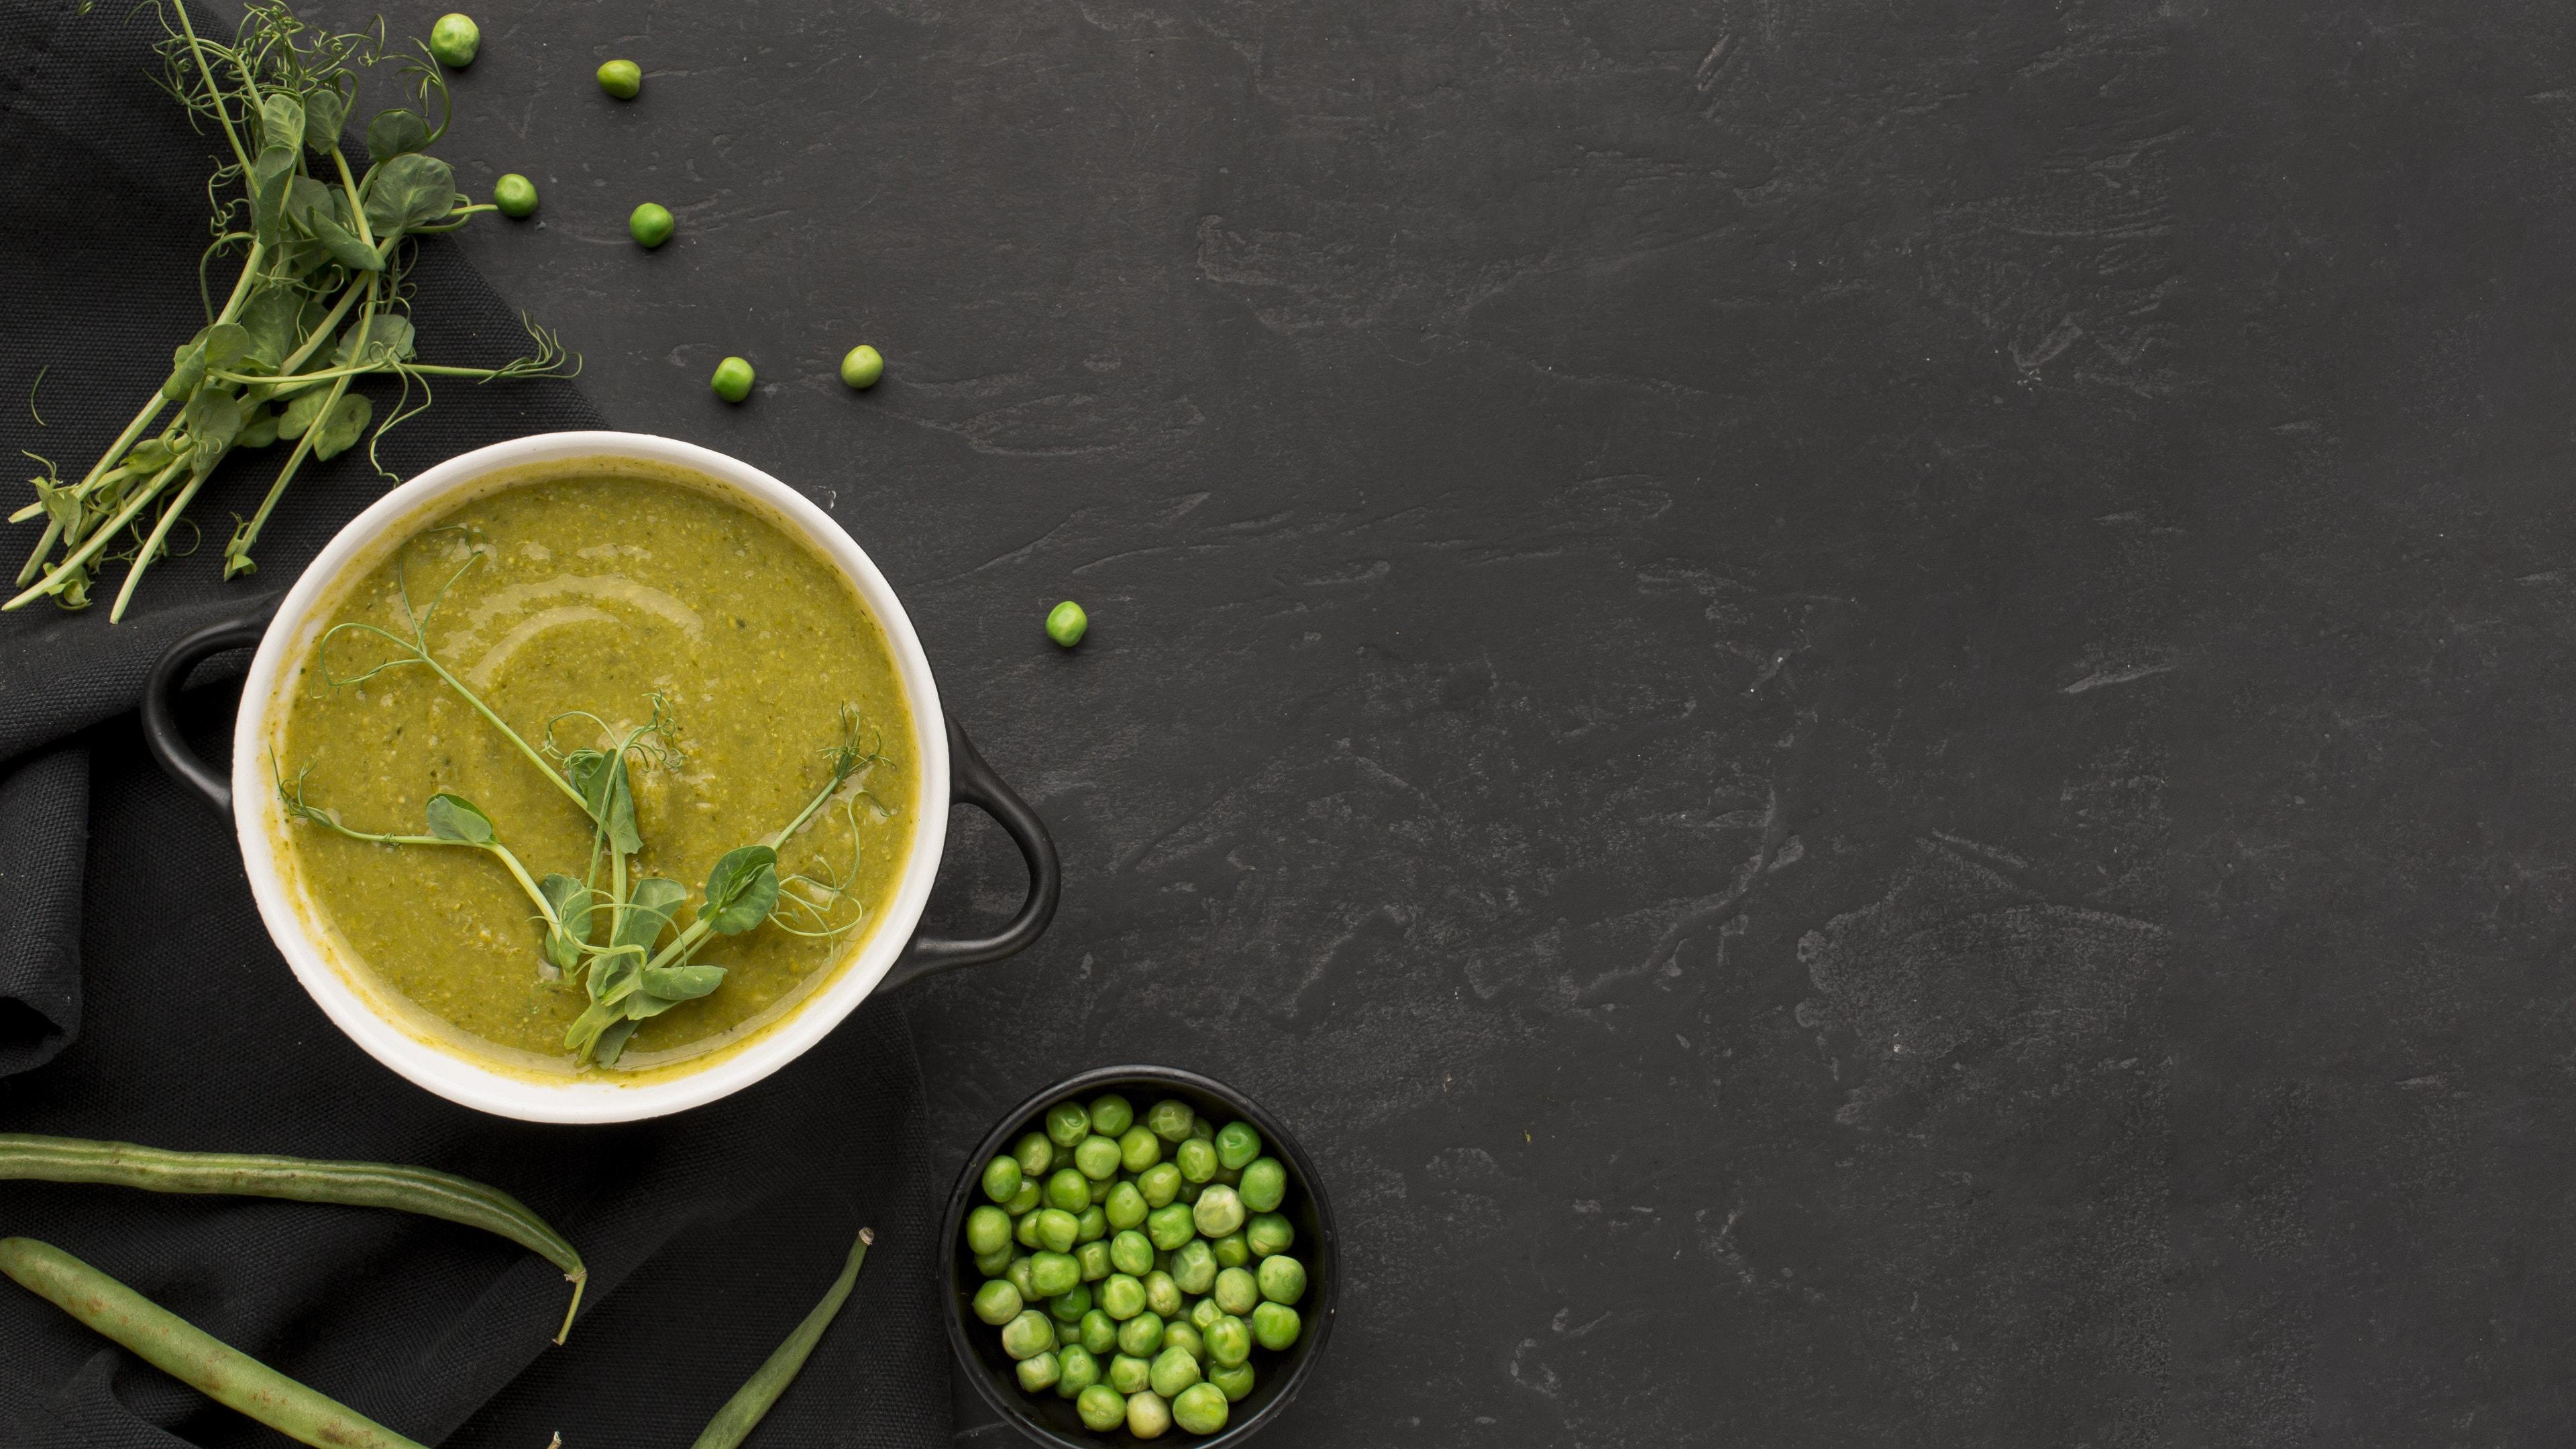 Green peas soup and fresh green peas